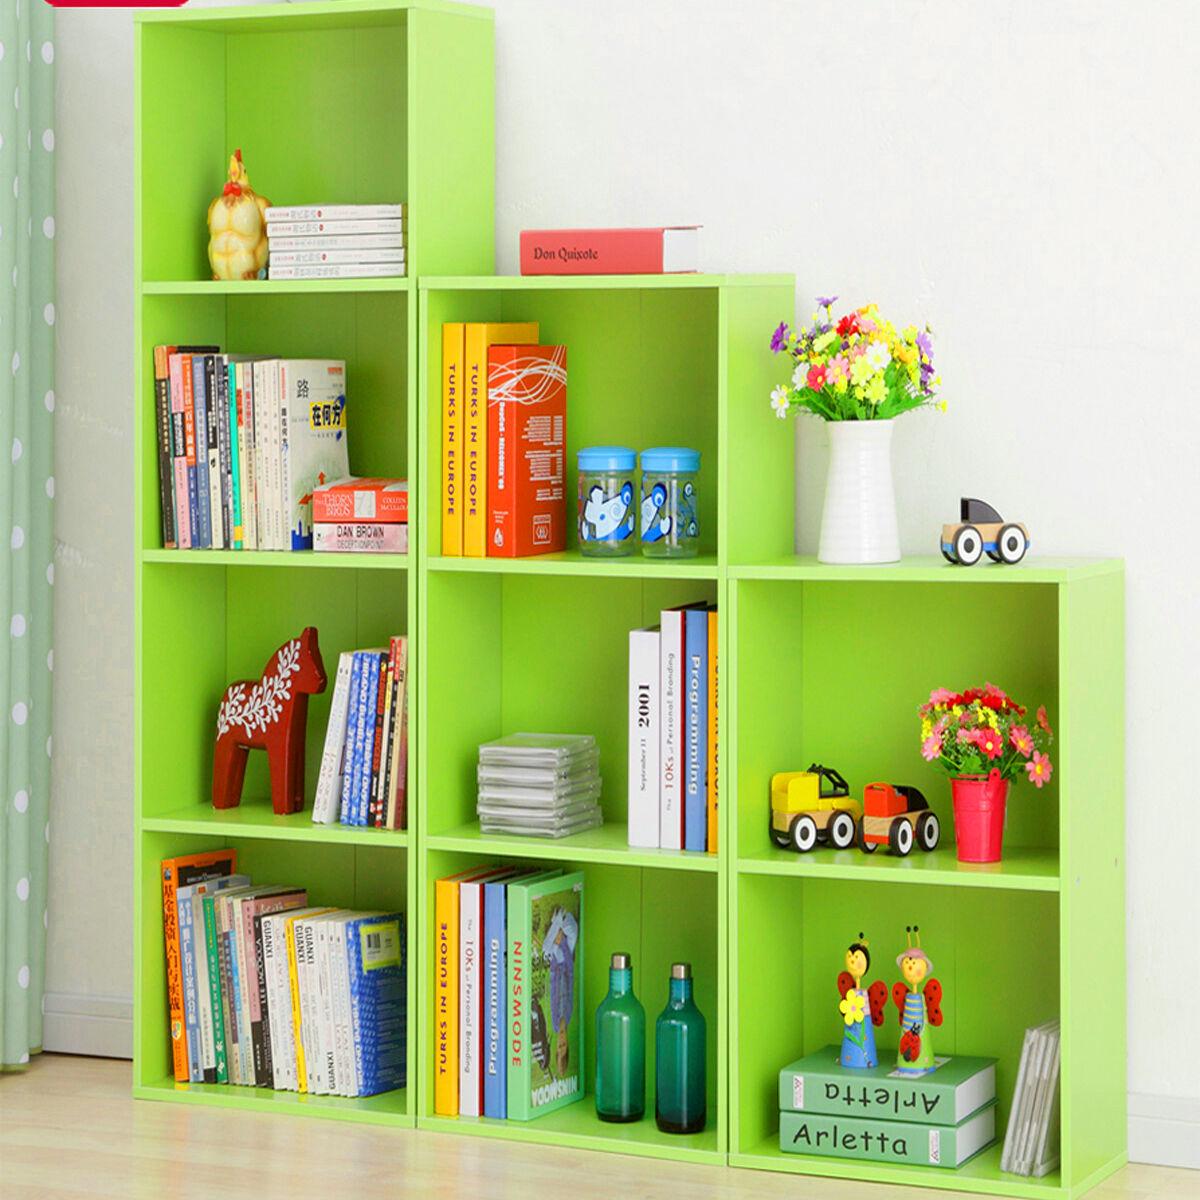 Timber Bookcase: Adjustable 4 Shelf Wood Bookcase Storage Shelving Book